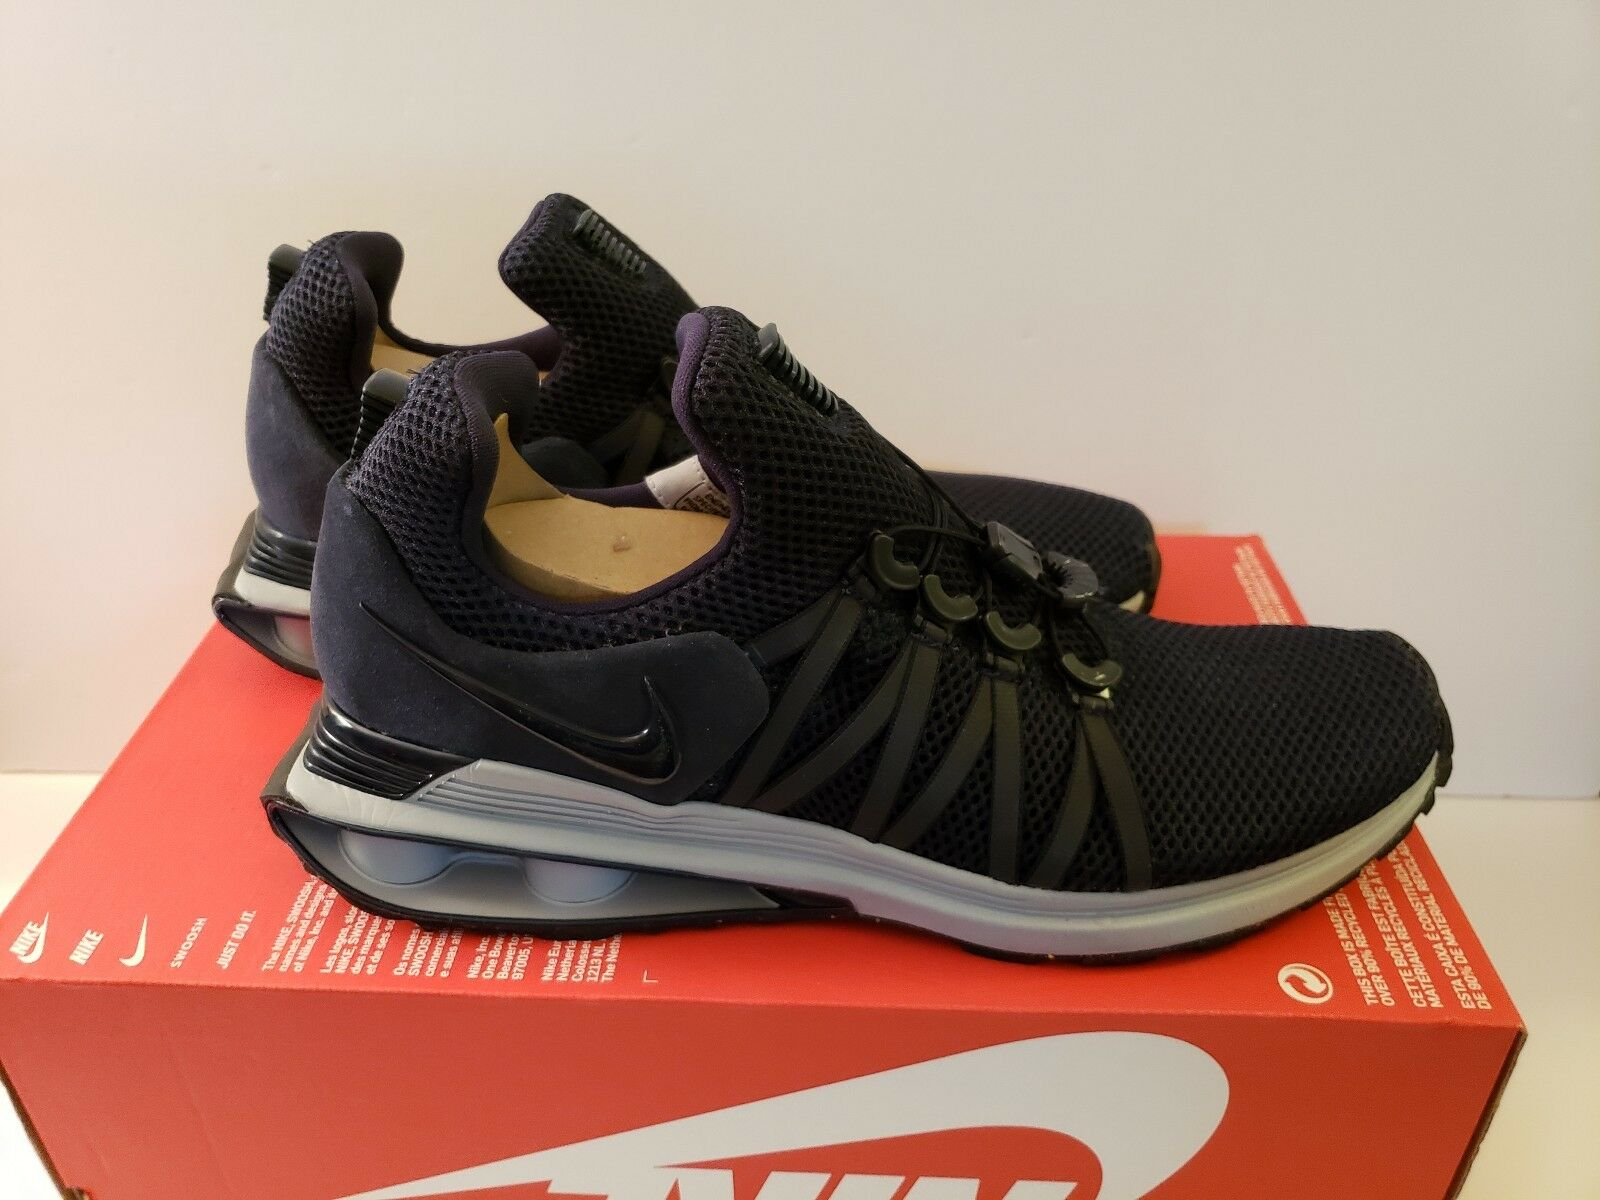 Nike Shox Gravity Sz 11.5 New AR1999 402  trainer running shoes